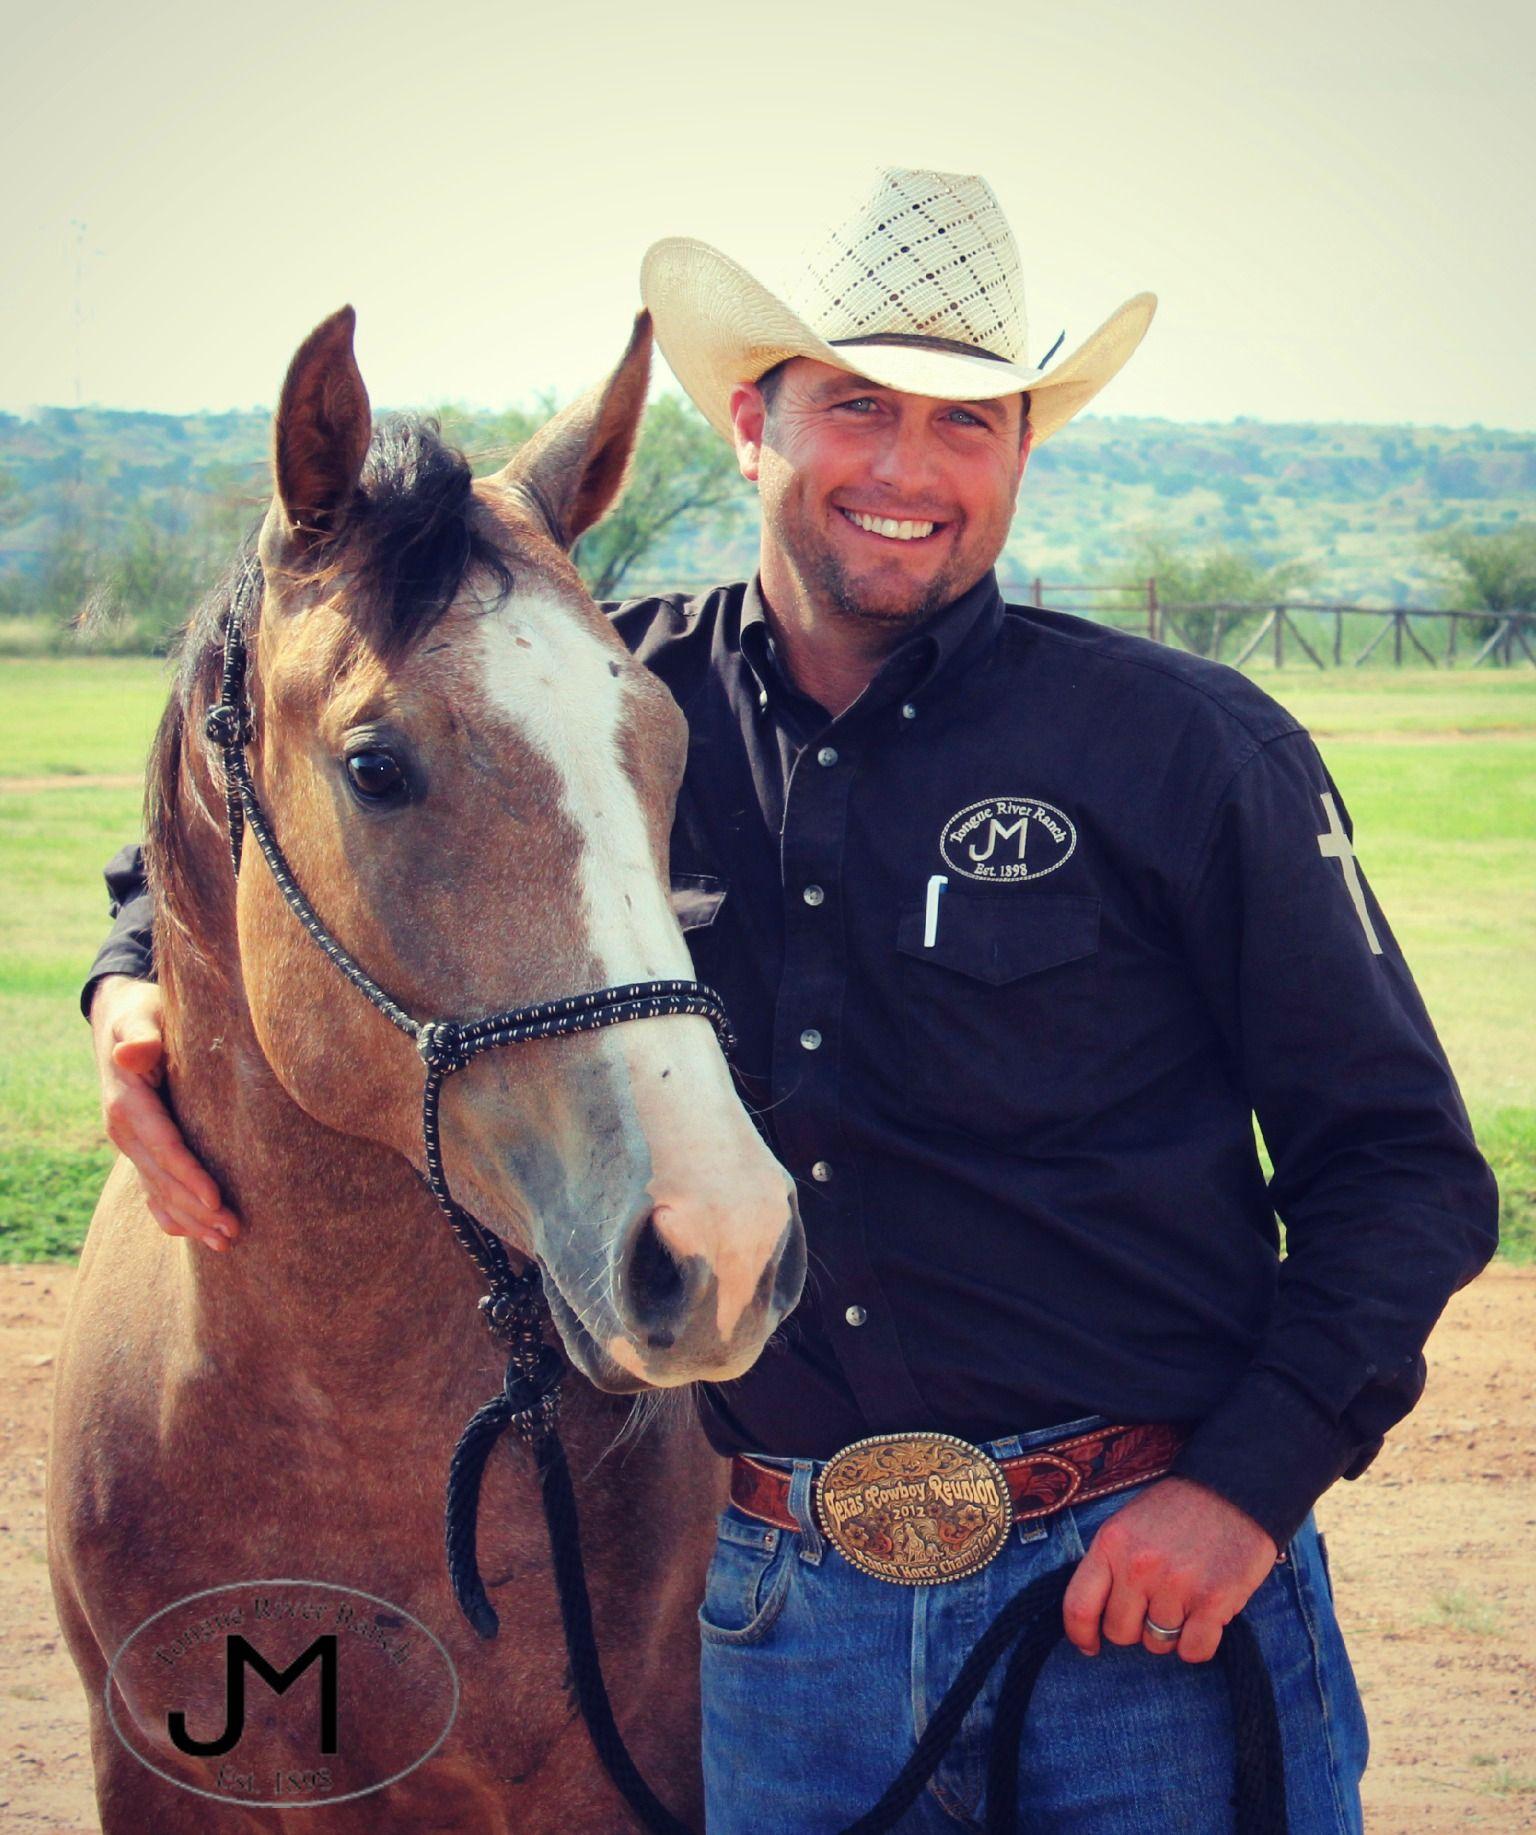 Texas Cowboy Tongue River Ranch Ranch Manager With